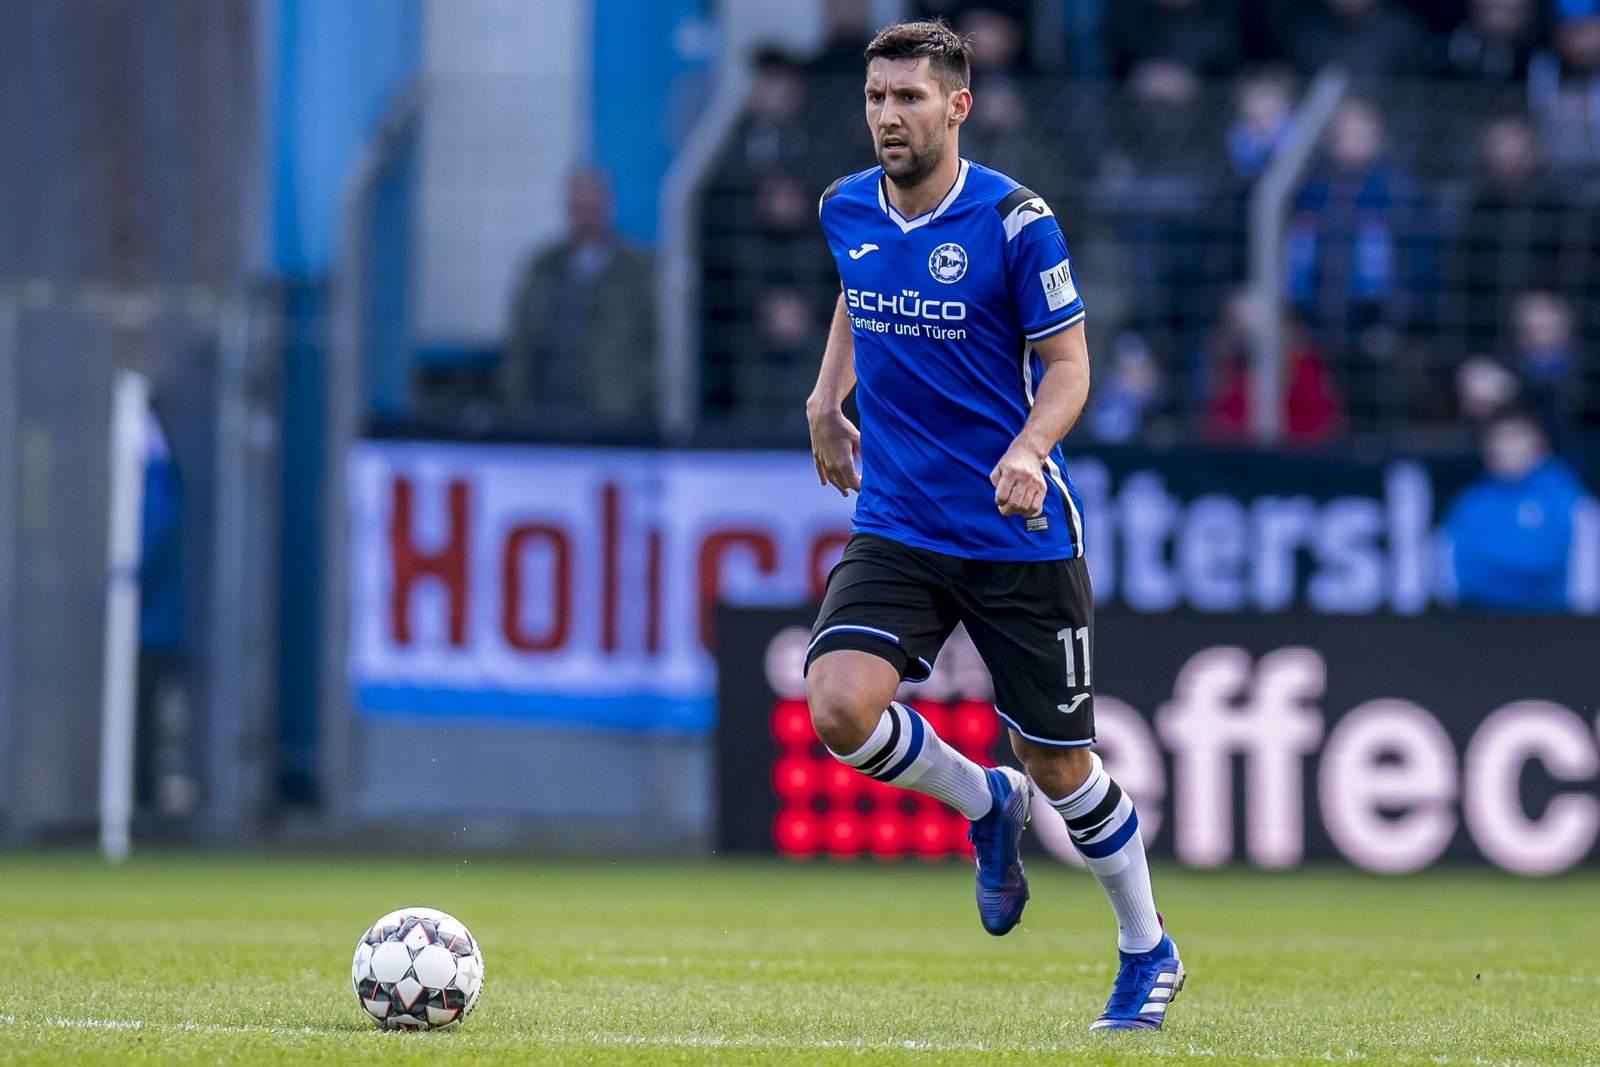 Stephan Salger am Ball für Arminia Bielefeld